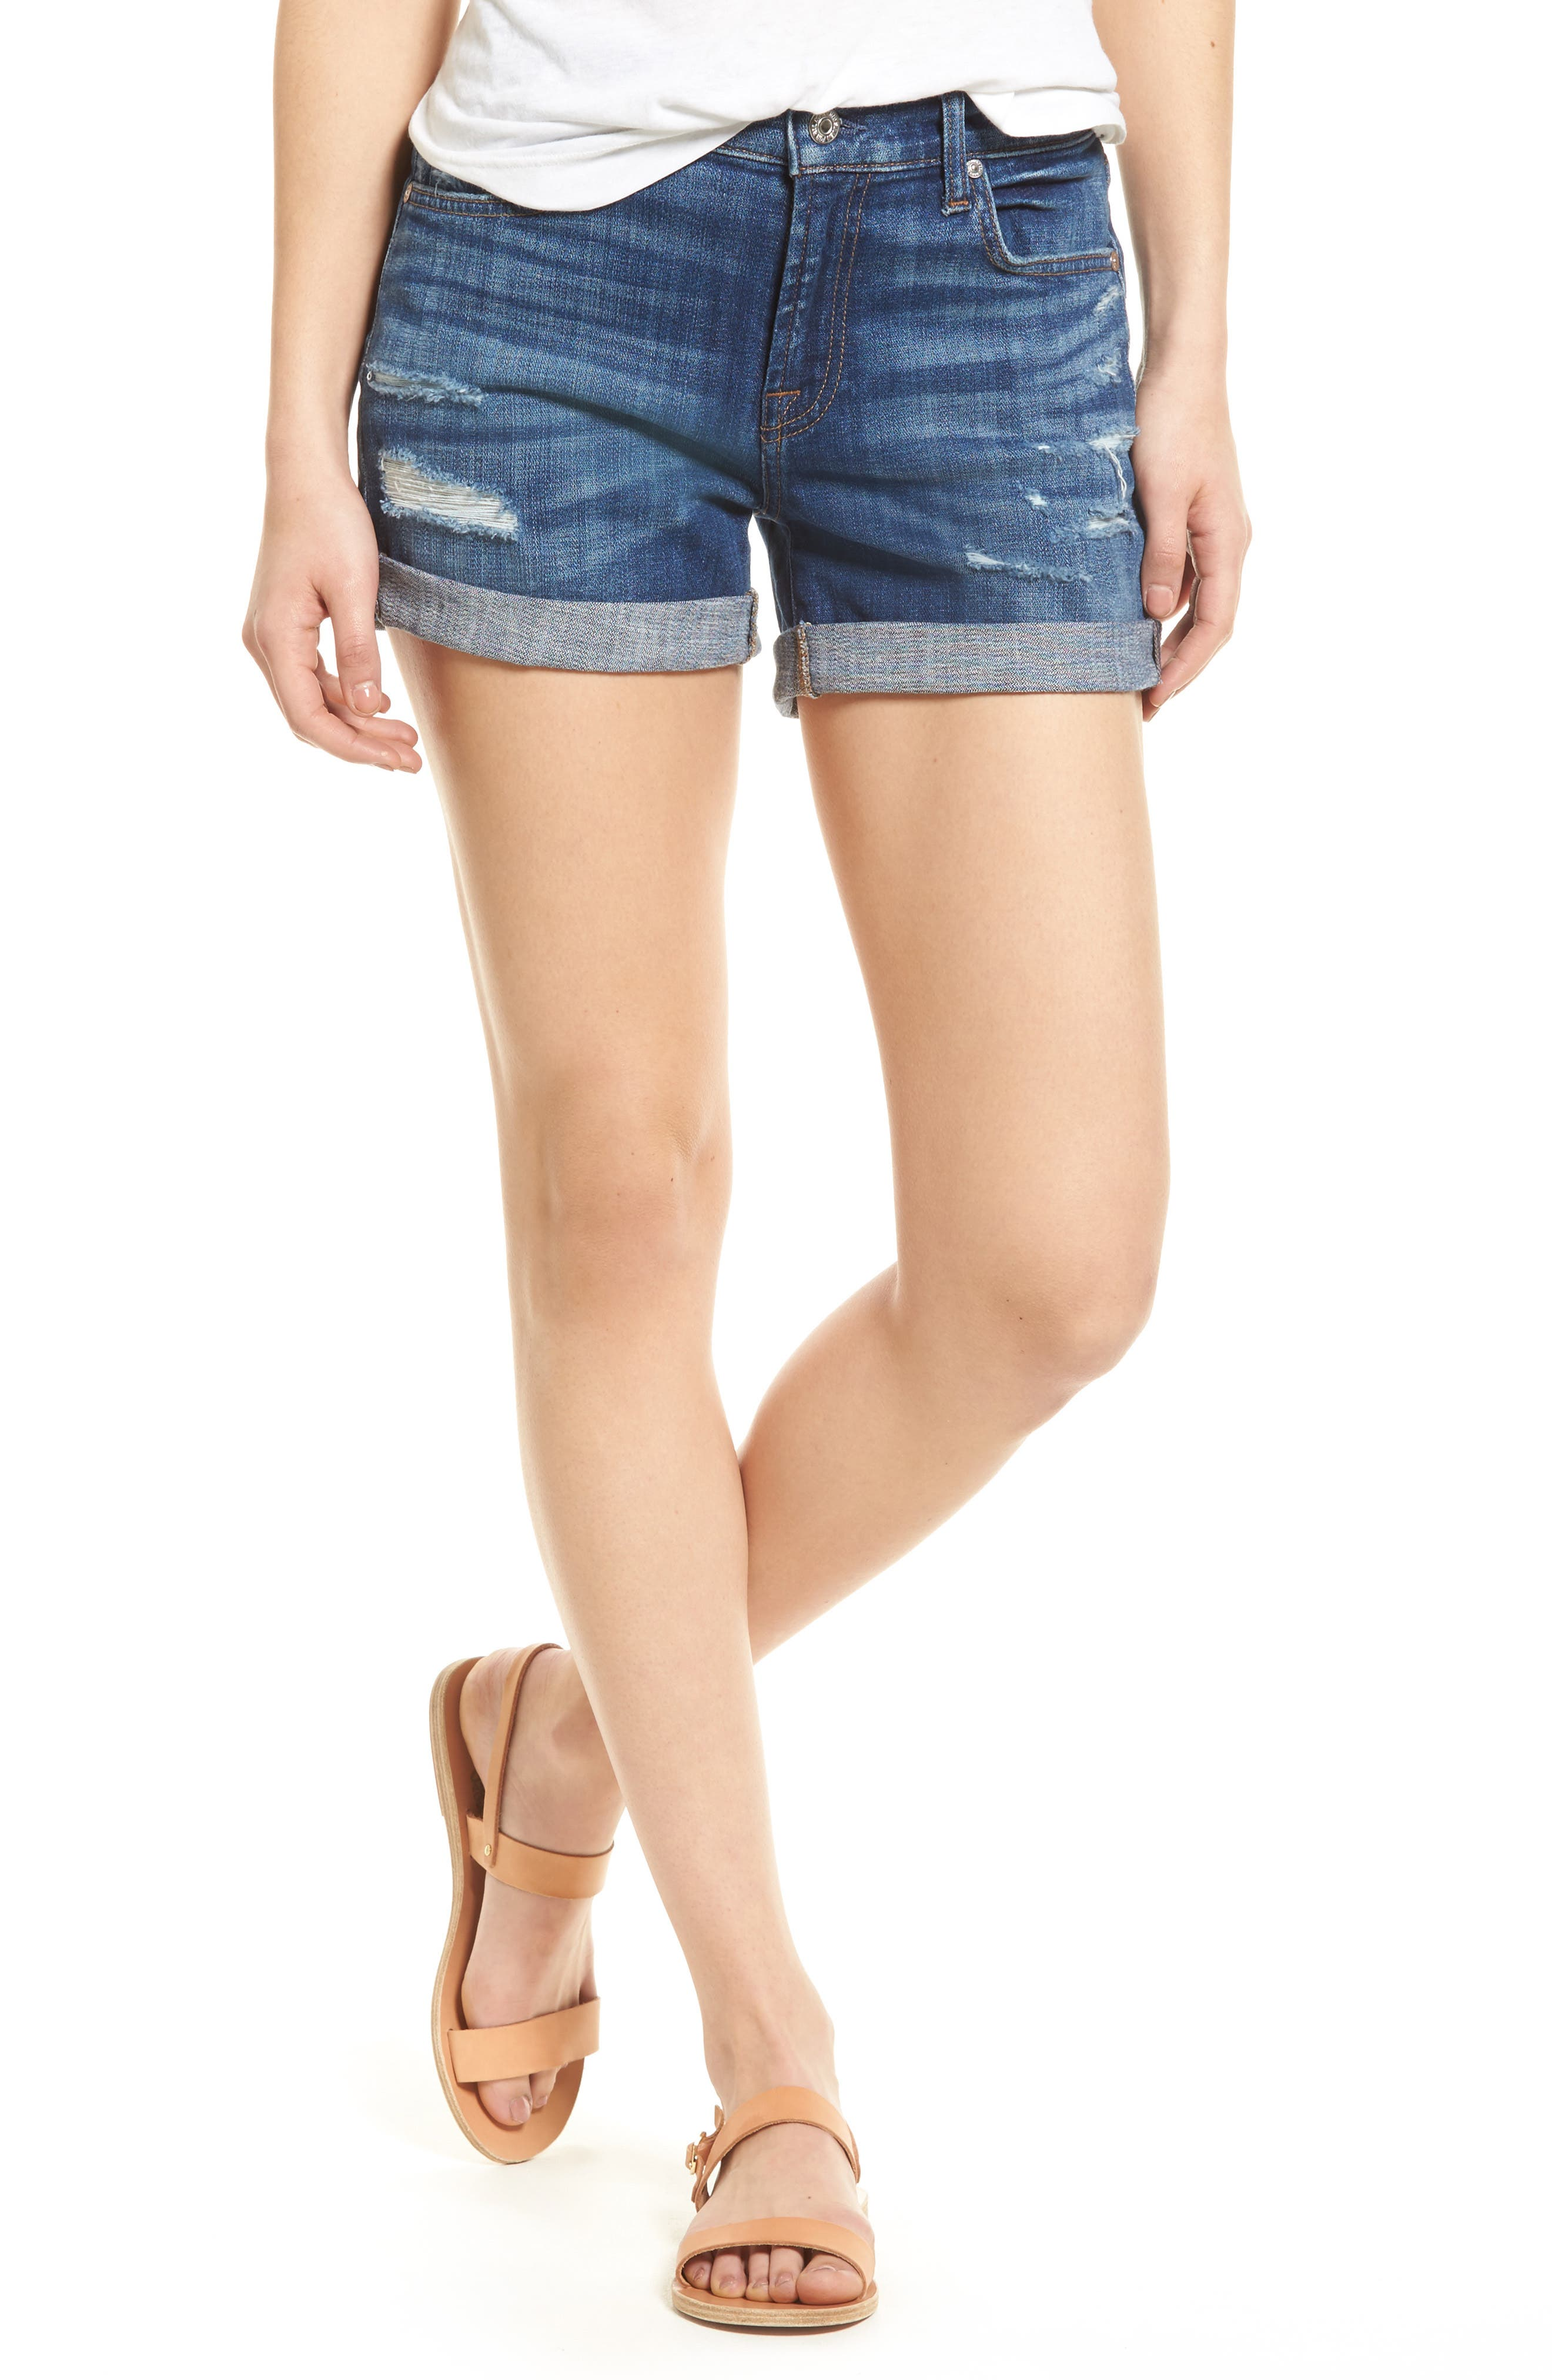 Roll Cuff Denim Shorts,                         Main,                         color, BROKE TWILLS DESERT TRAILS 2